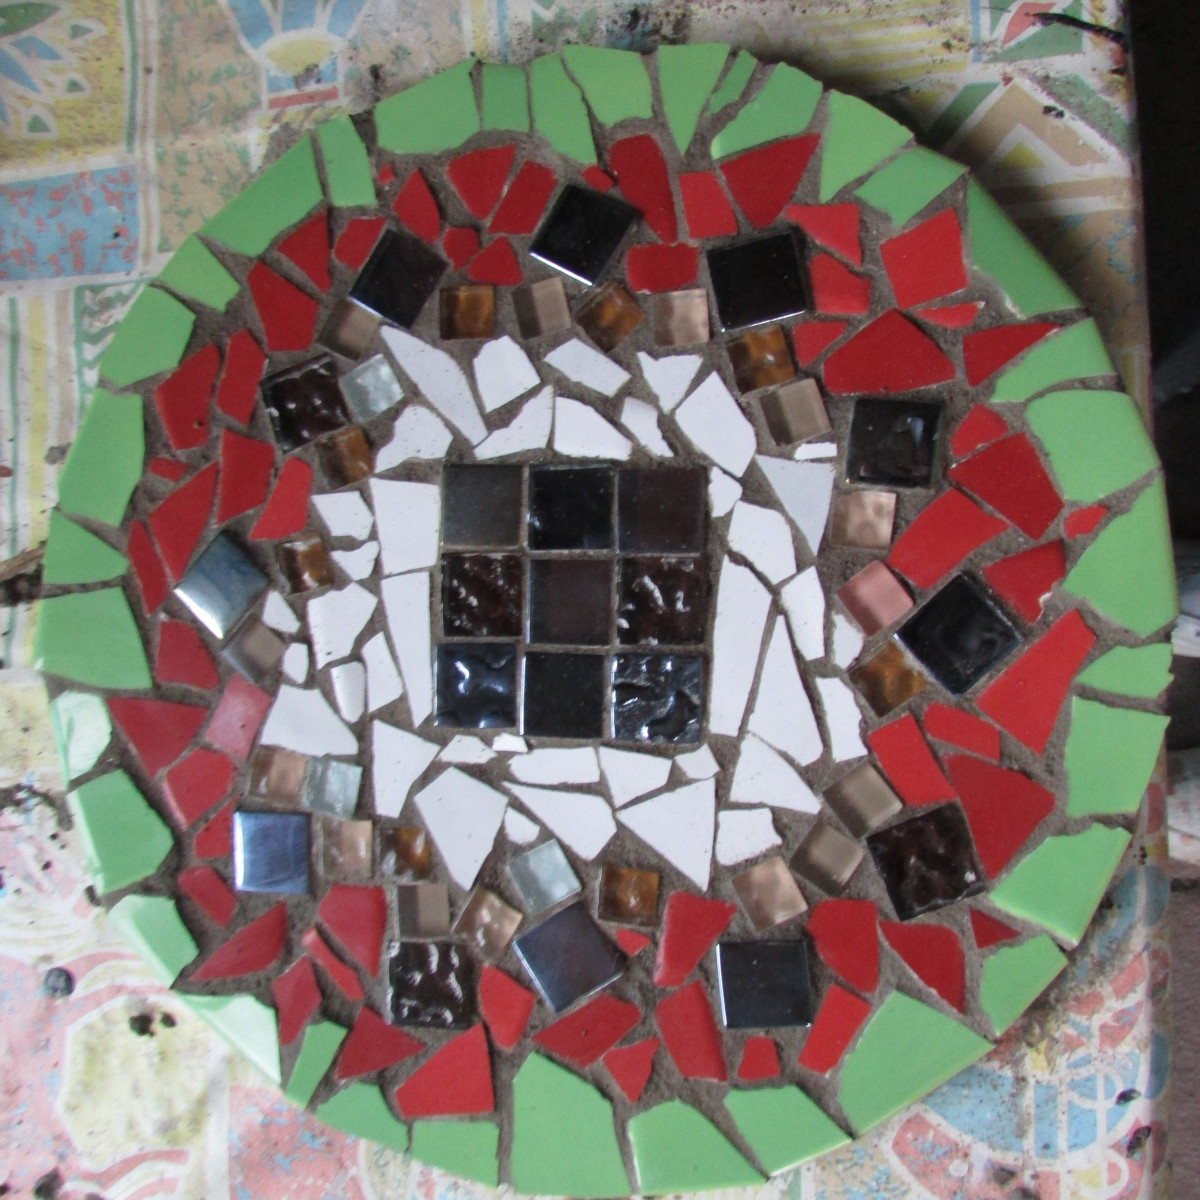 DIY Mosaic Designs